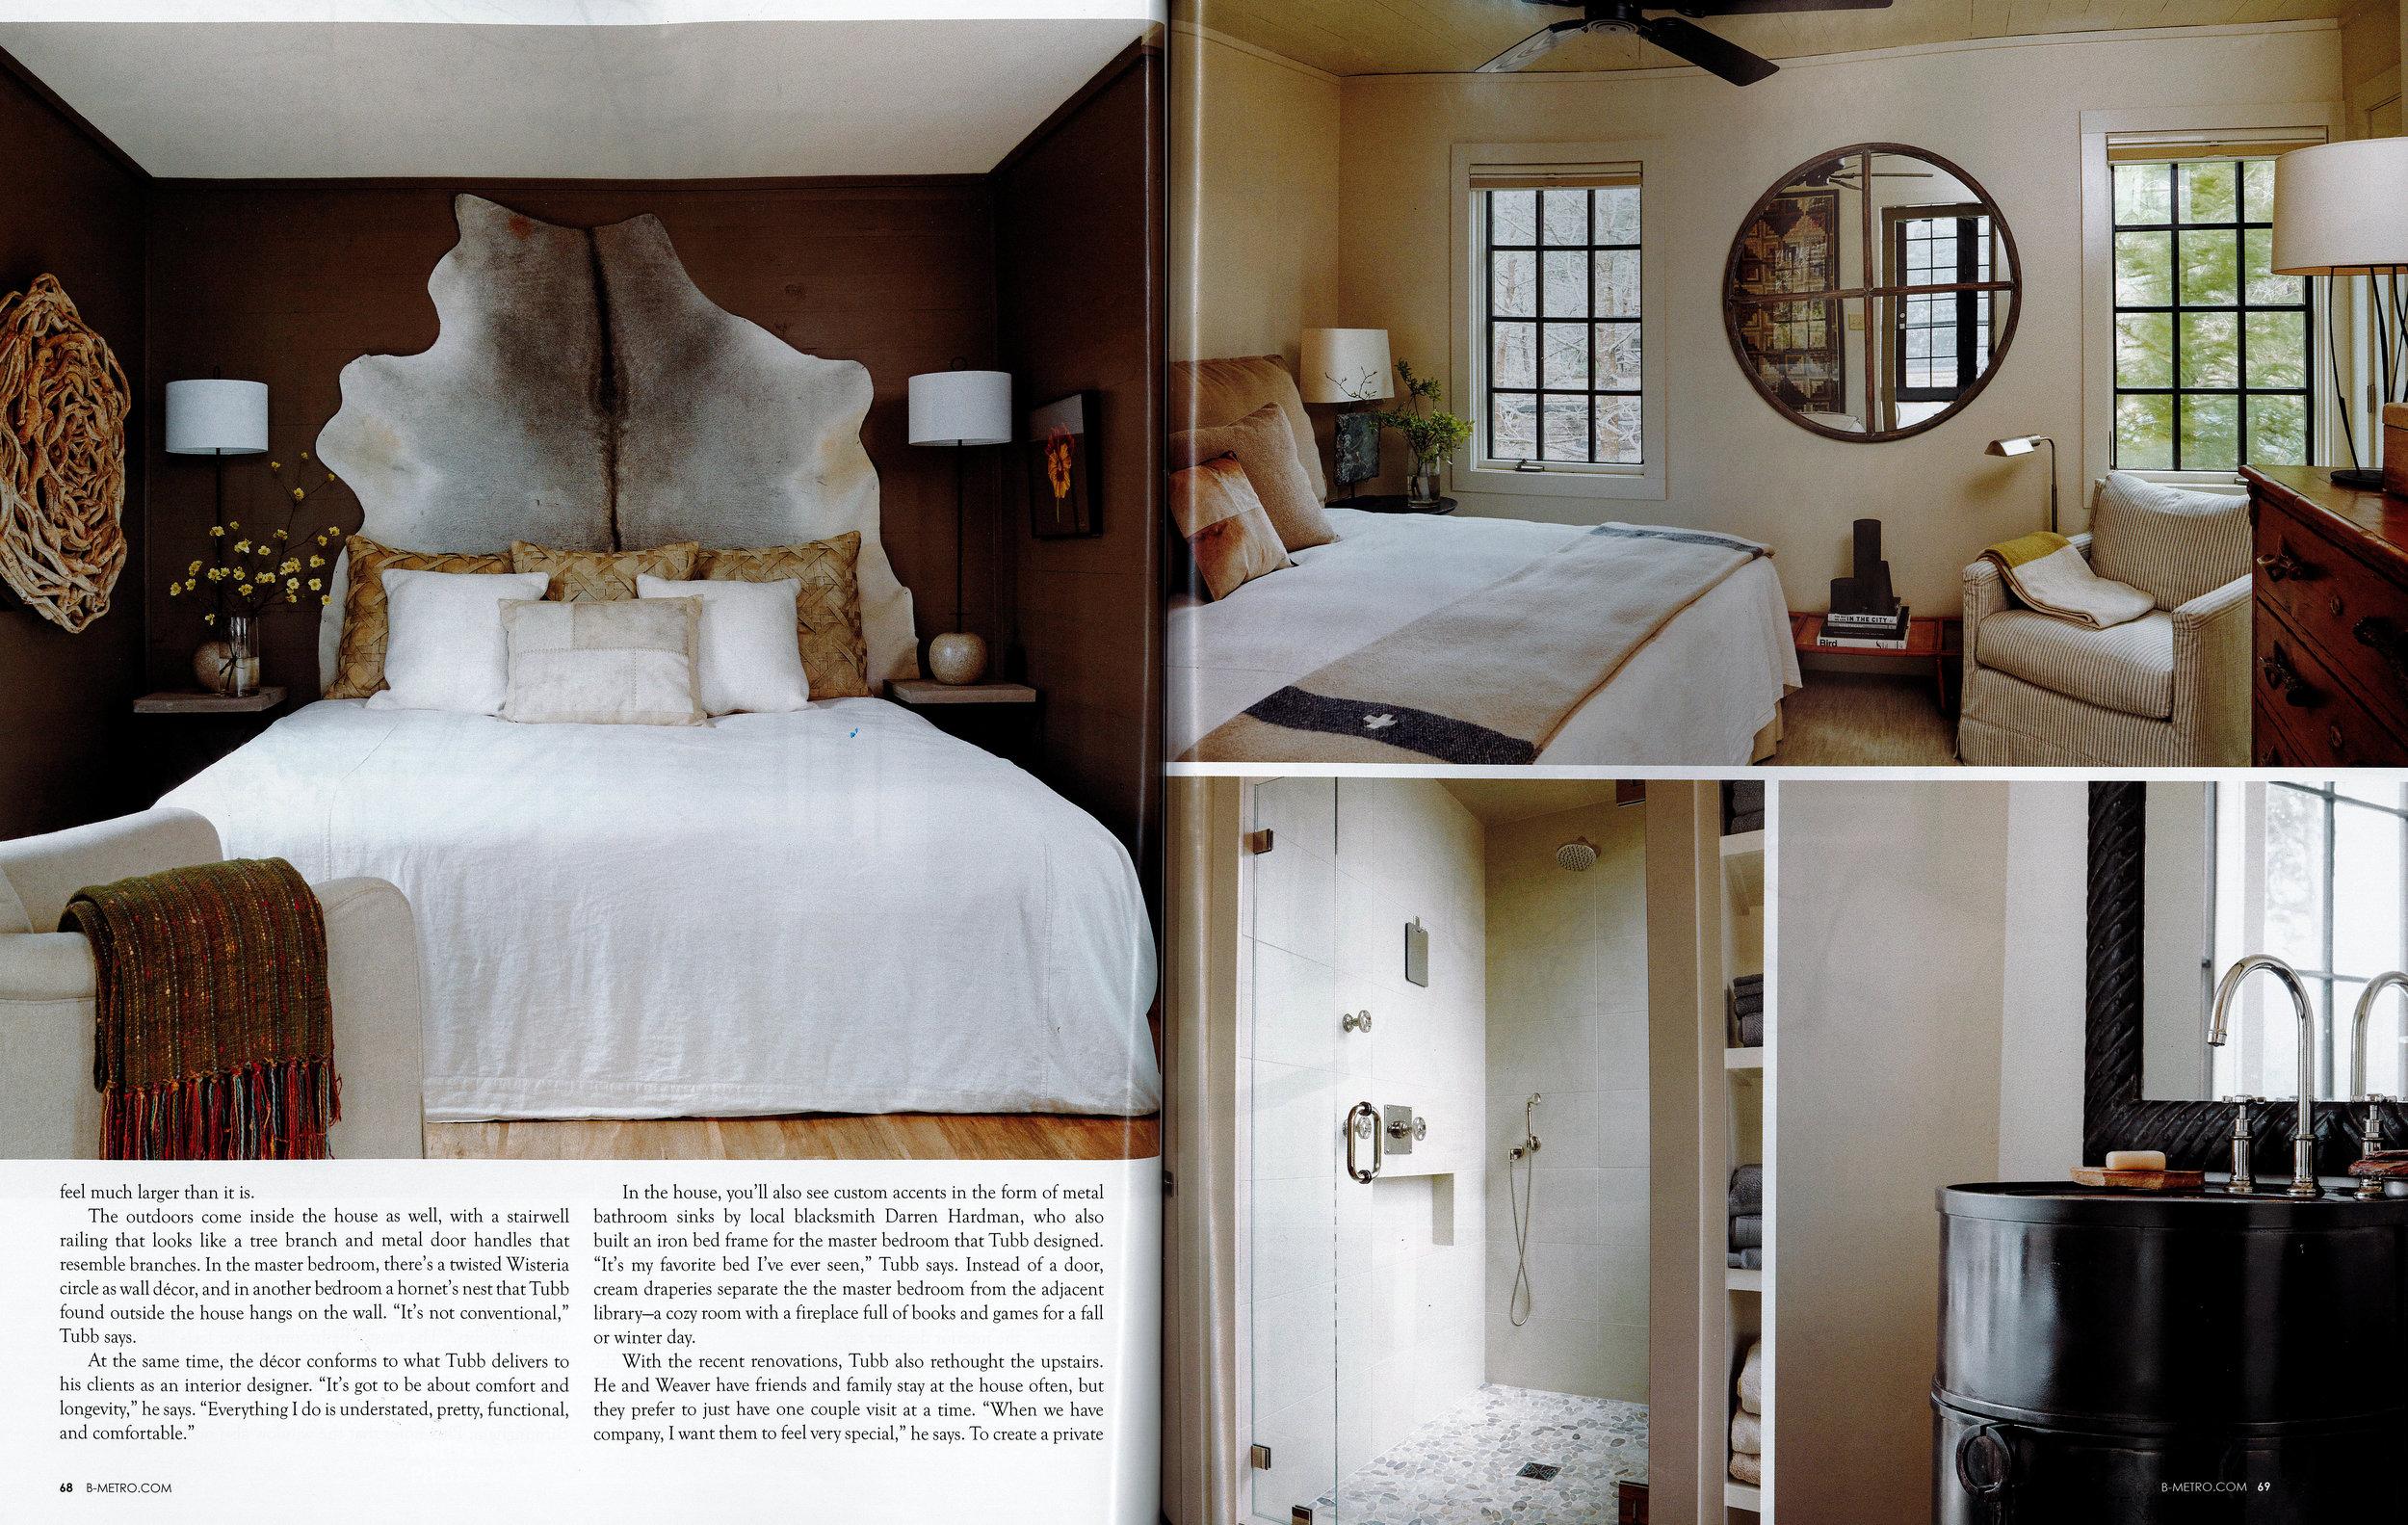 B-metro Magazine 2016 7 sticks lake house page 2 architecture exterior and interior design Alabama